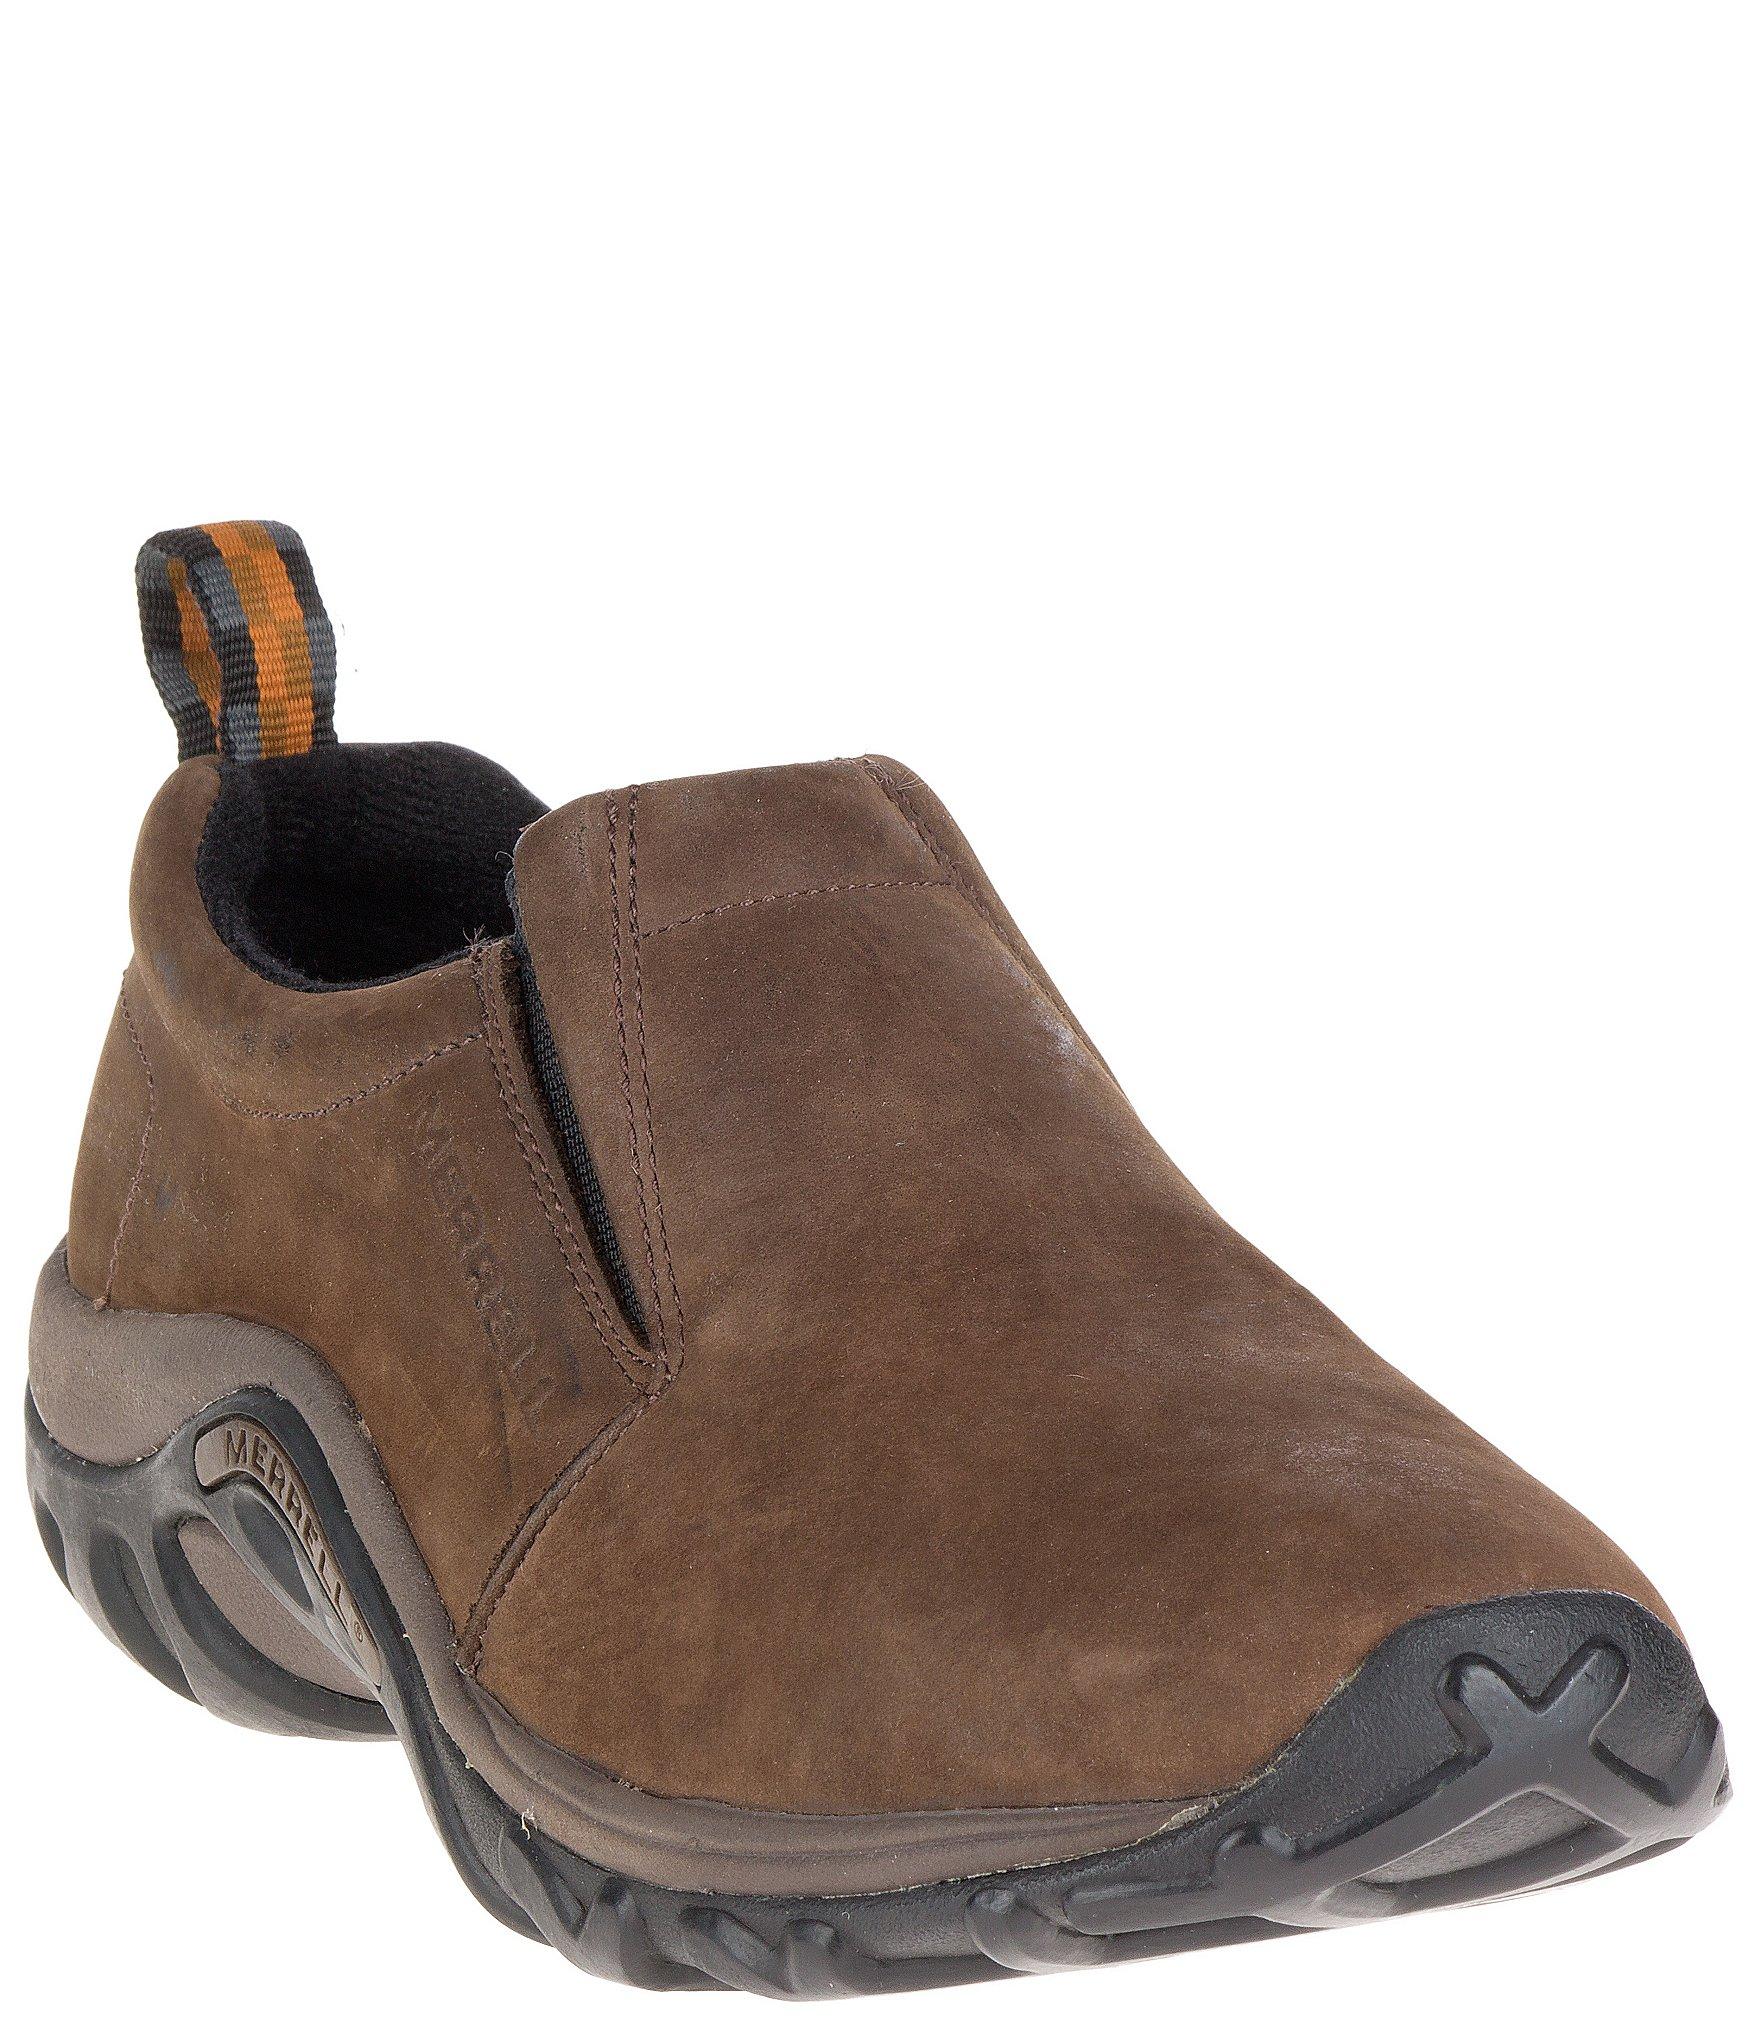 Dillards Merrell Shoes Sale